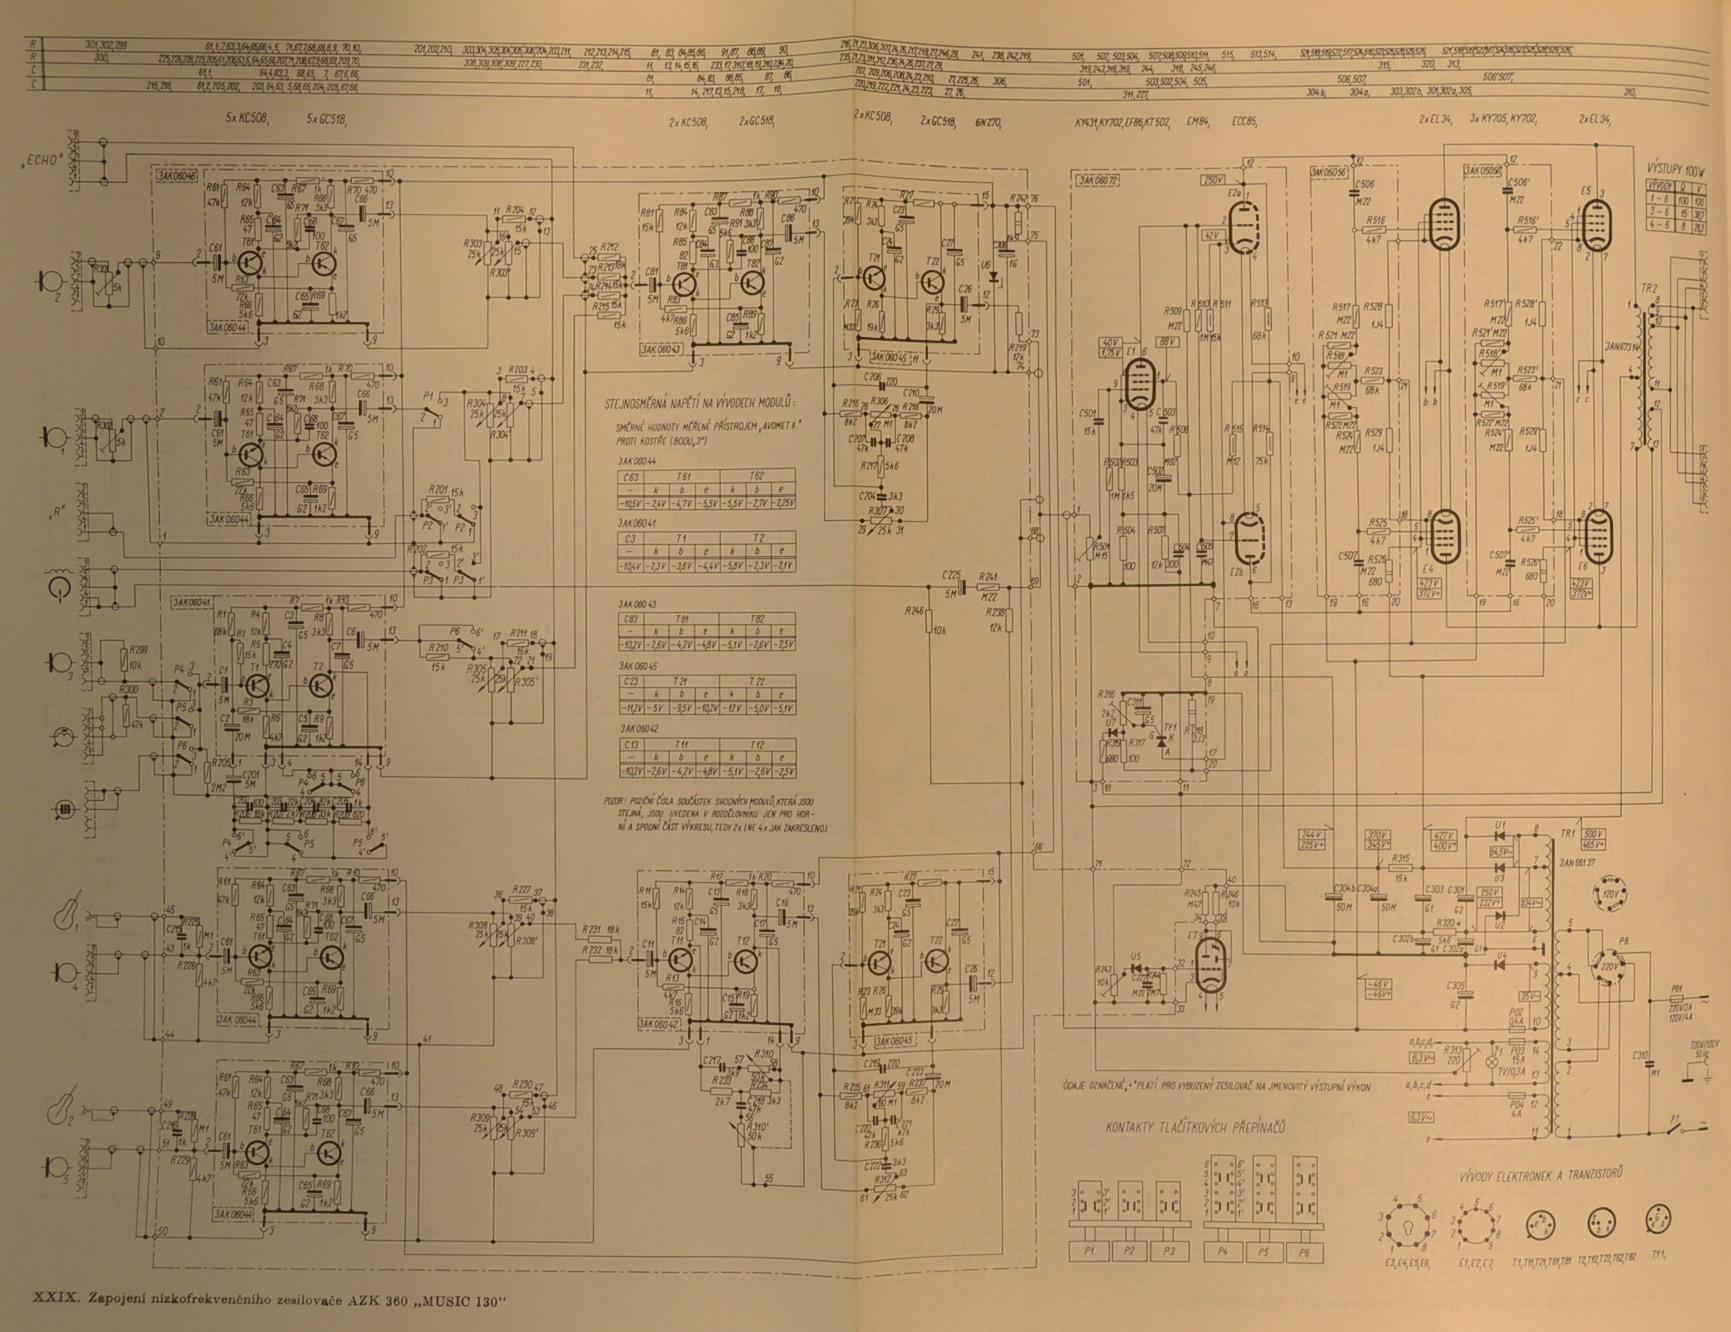 EP2239106B1 additionally Iron Man Blueprints Mk42 371881341 moreover Electrical Transformer Schematic Get Free Image About Wiring Diagram additionally Laserccb besides Tesla Azk 360 Tesla Music 130 Schema. on tesla schematics